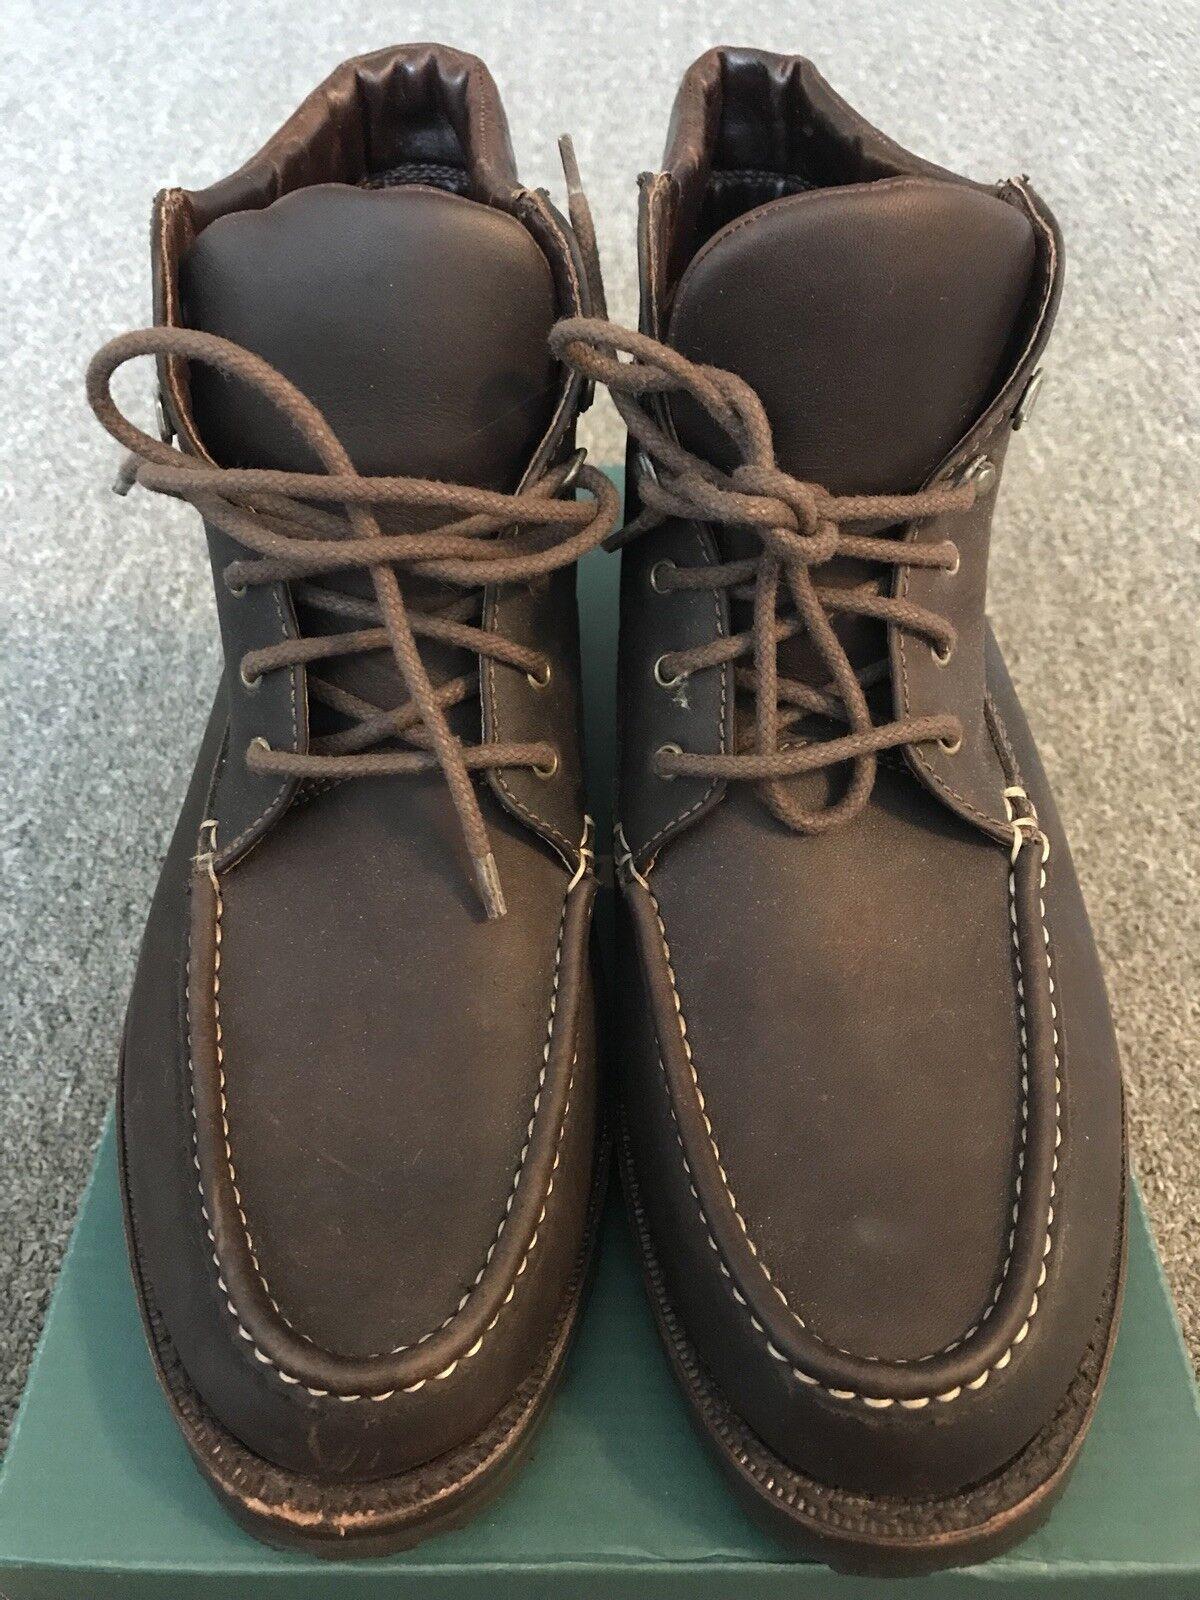 Men's Cole Haan Boots Size 10